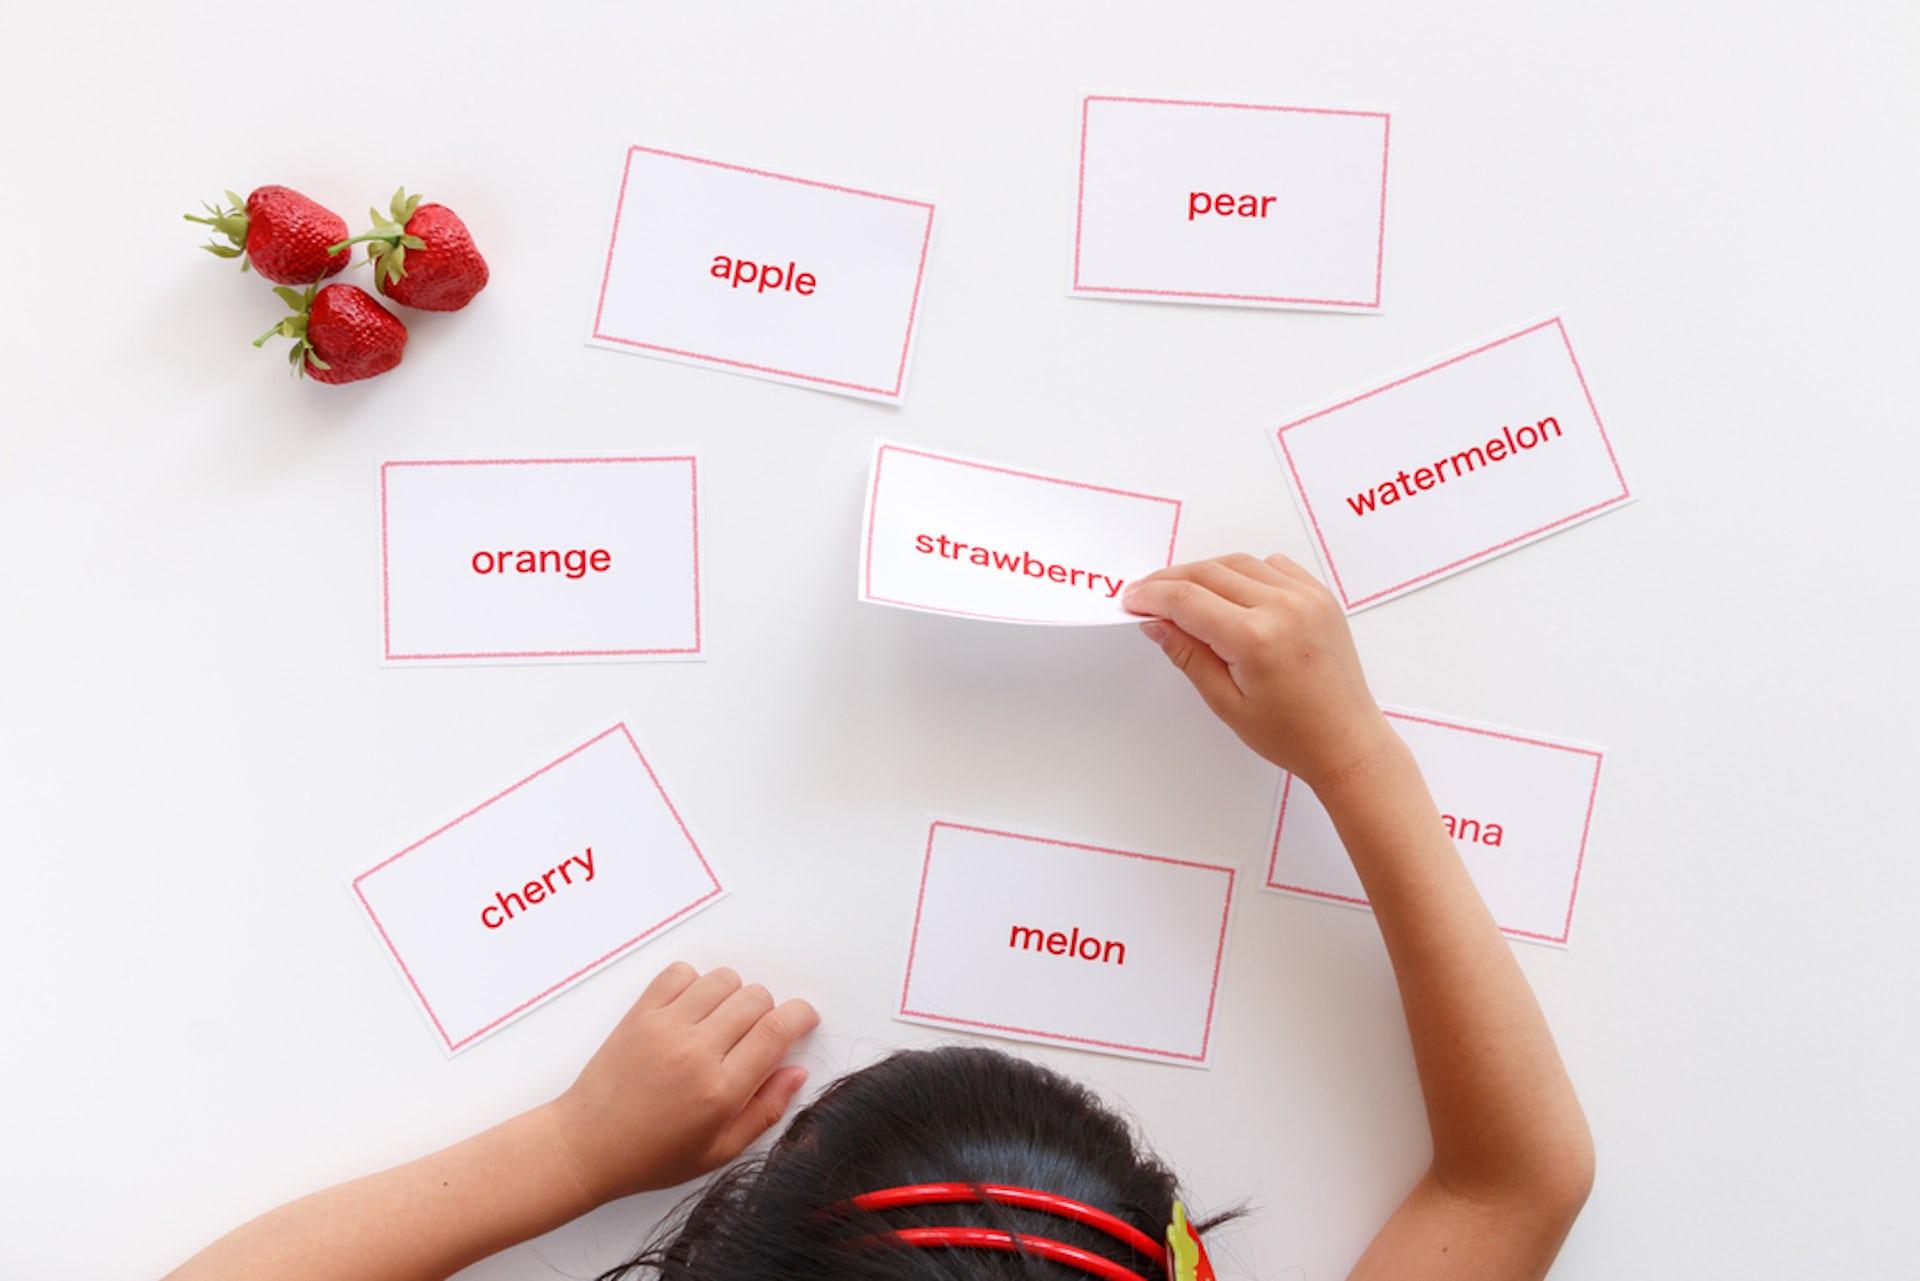 Non accommodating bilingualism